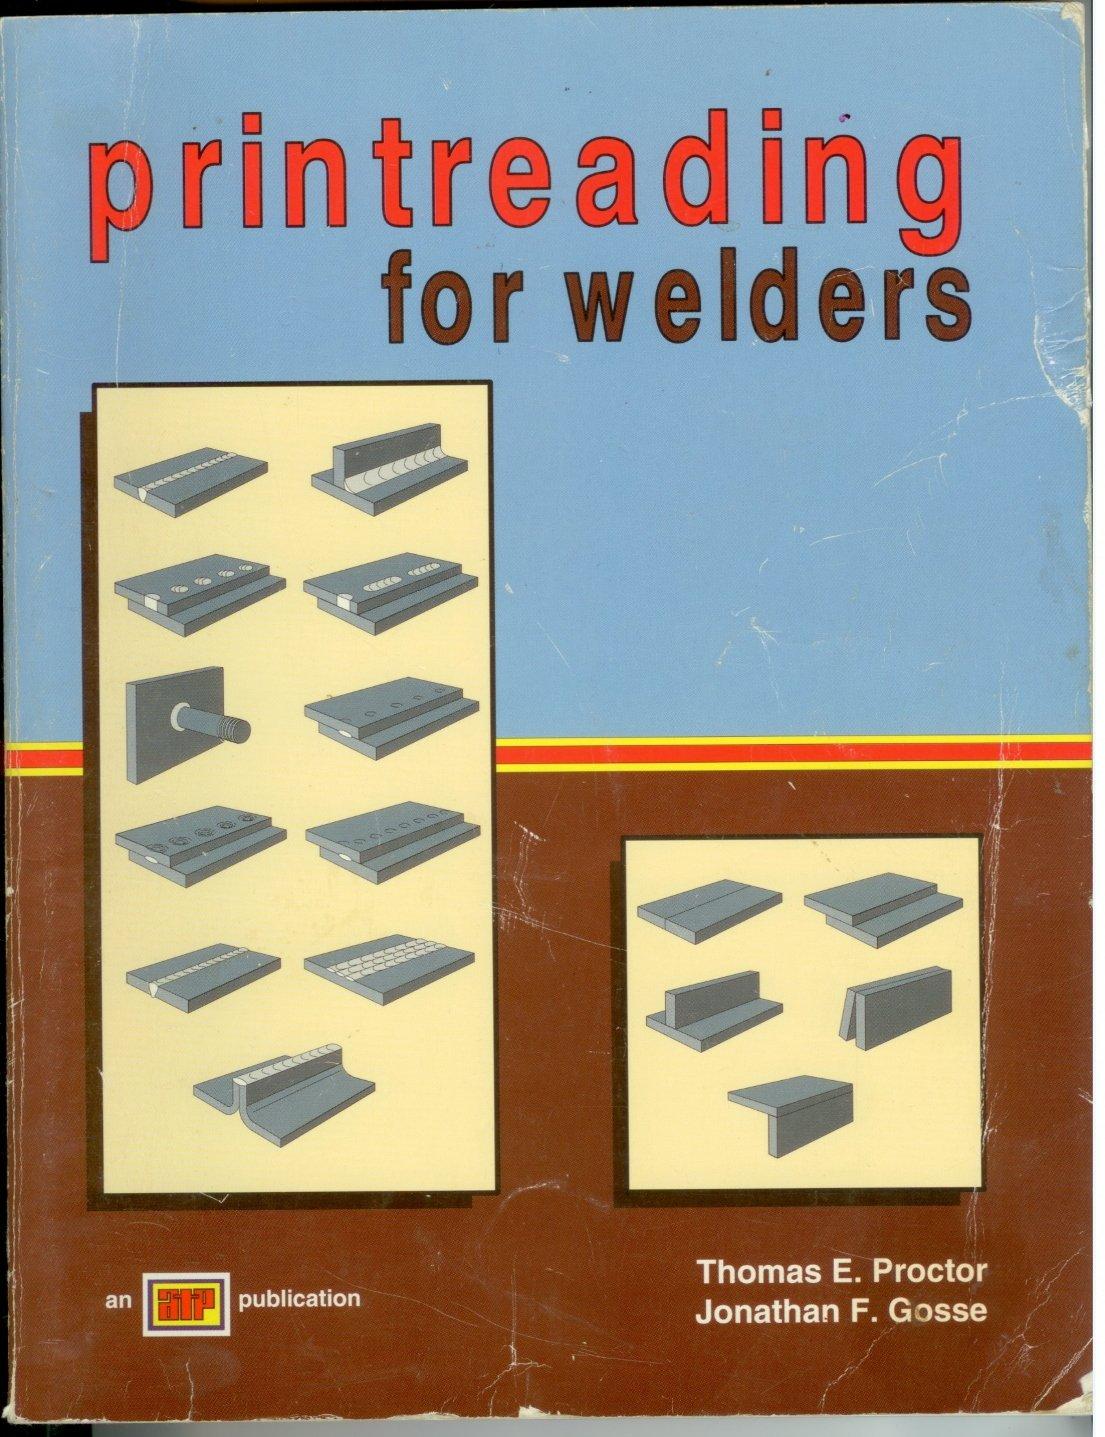 Printreading for Welders, Thomas E. Proctor, Jonathan F. Gosse